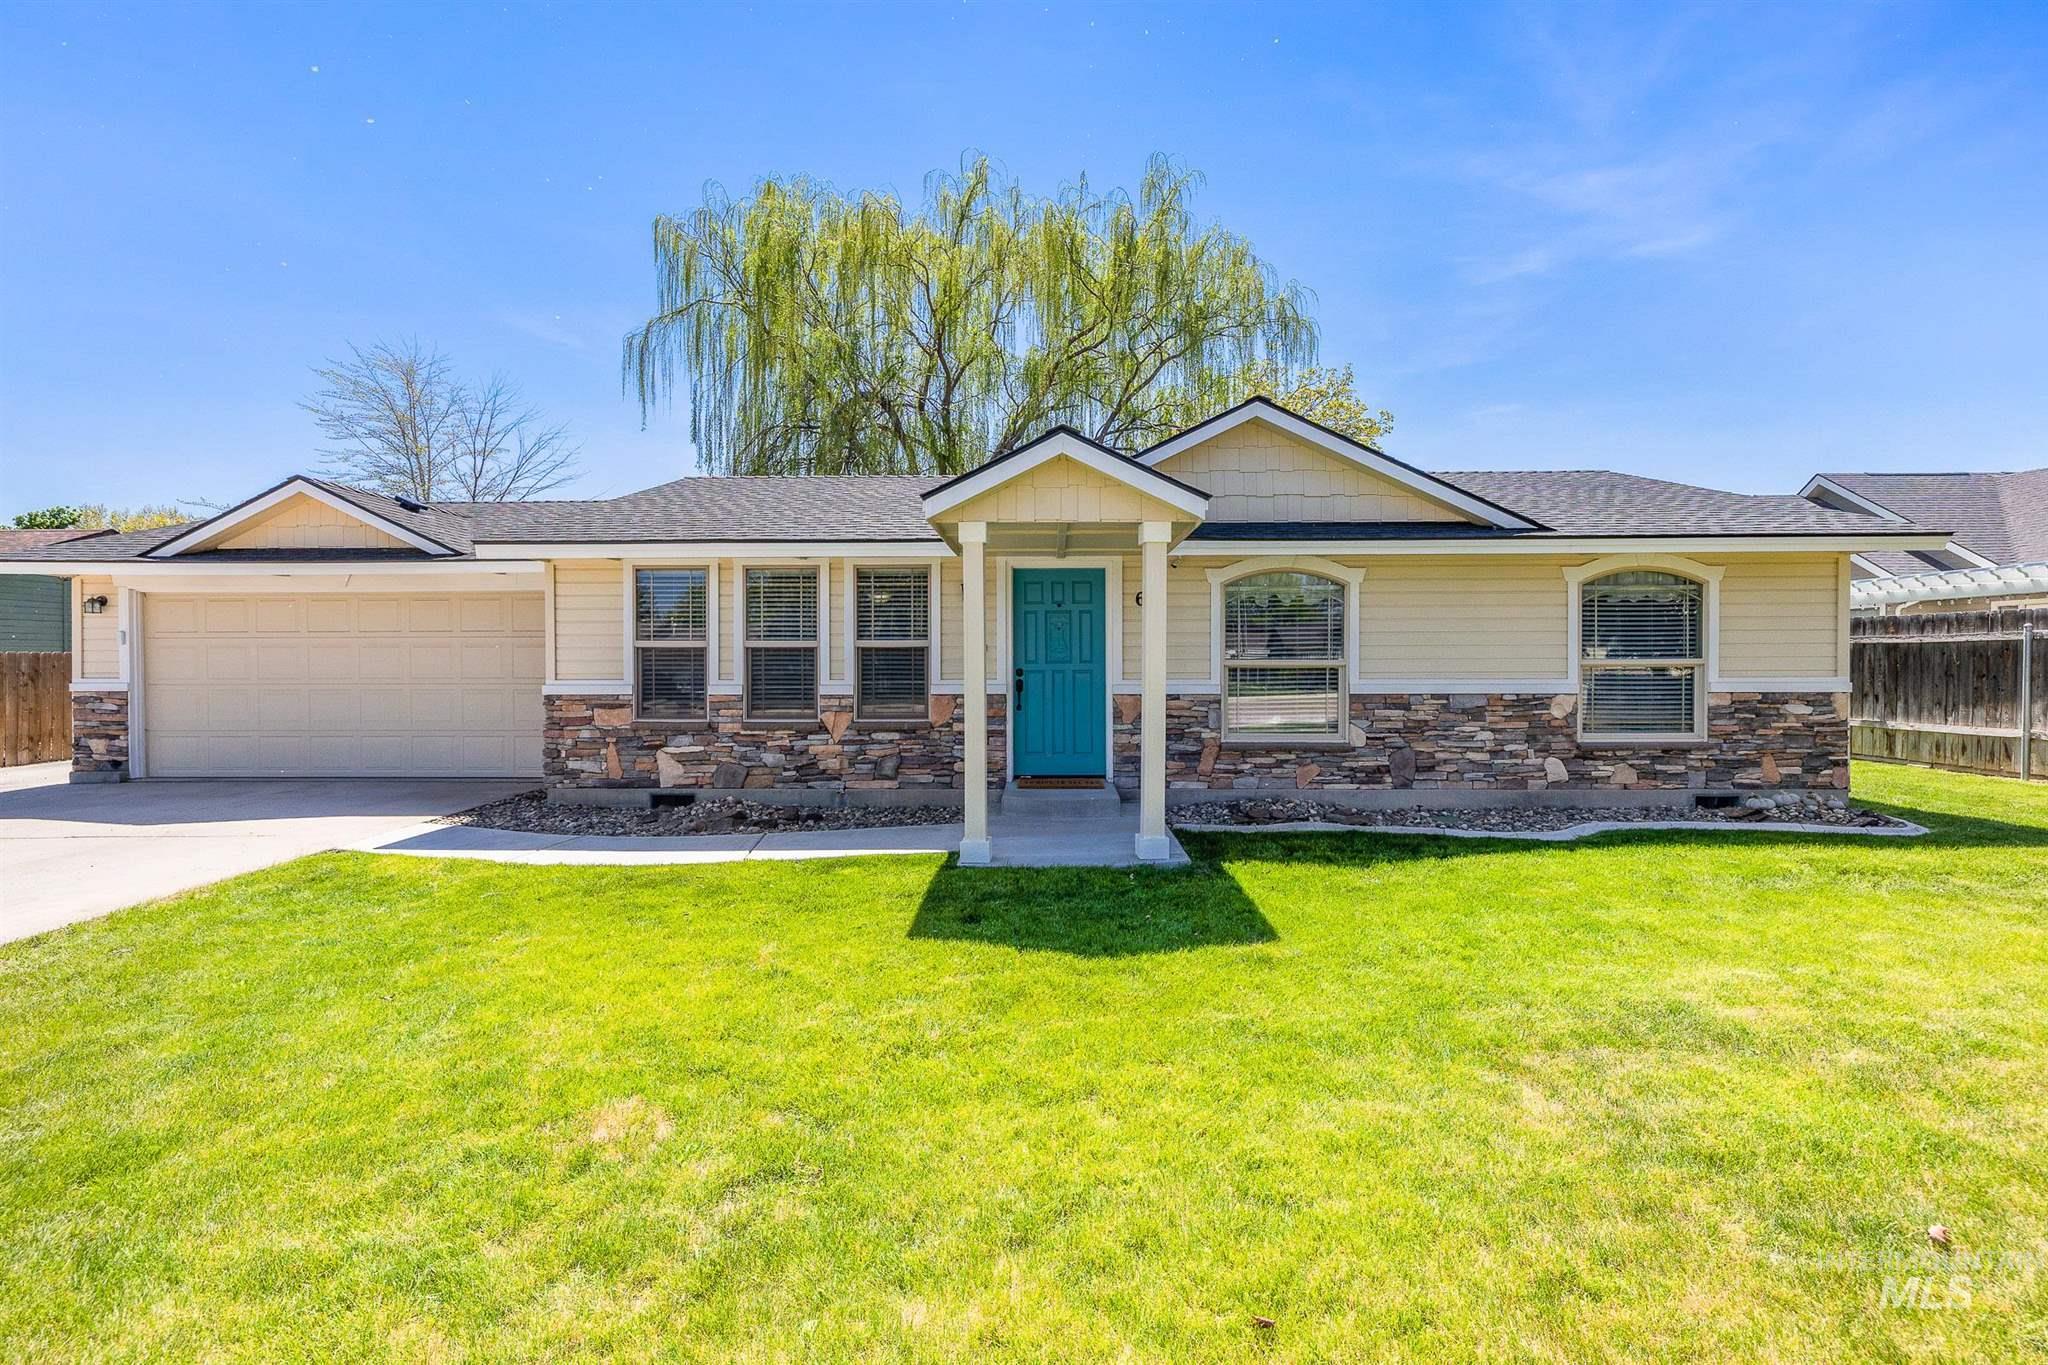 621 W Oak St Property Photo - Caldwell, ID real estate listing